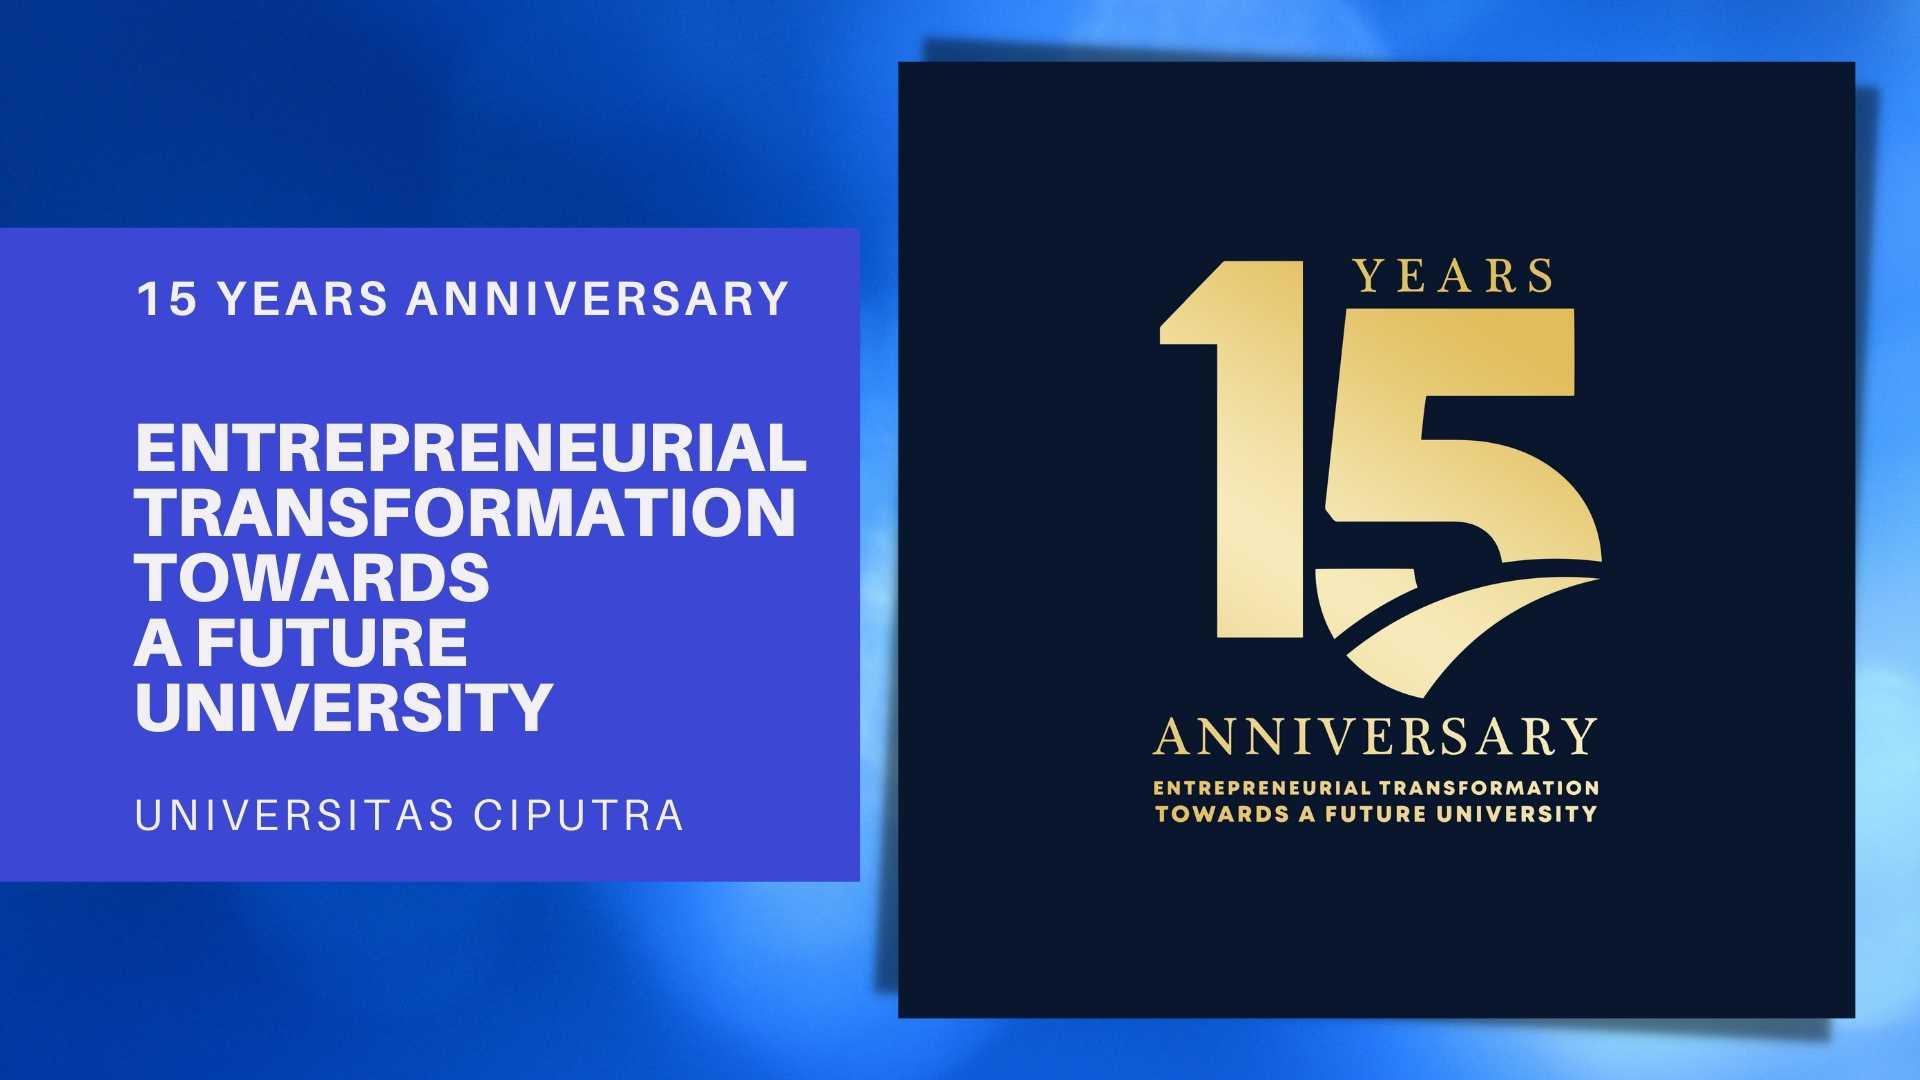 Entrepreneurial Transformation Towards a Future University